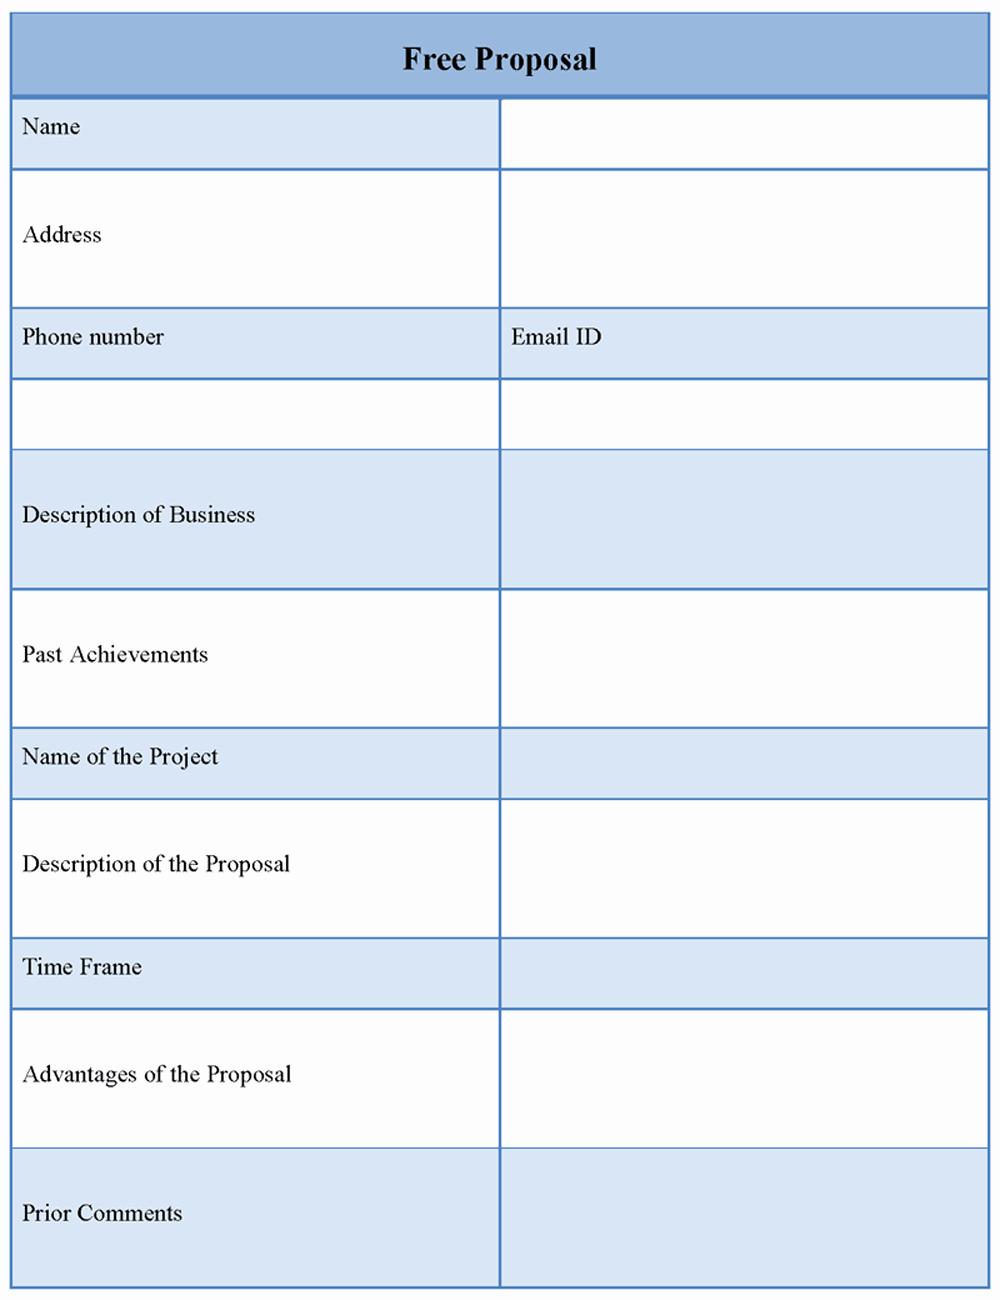 Free Proposal form Template Elegant Free Proposal Template